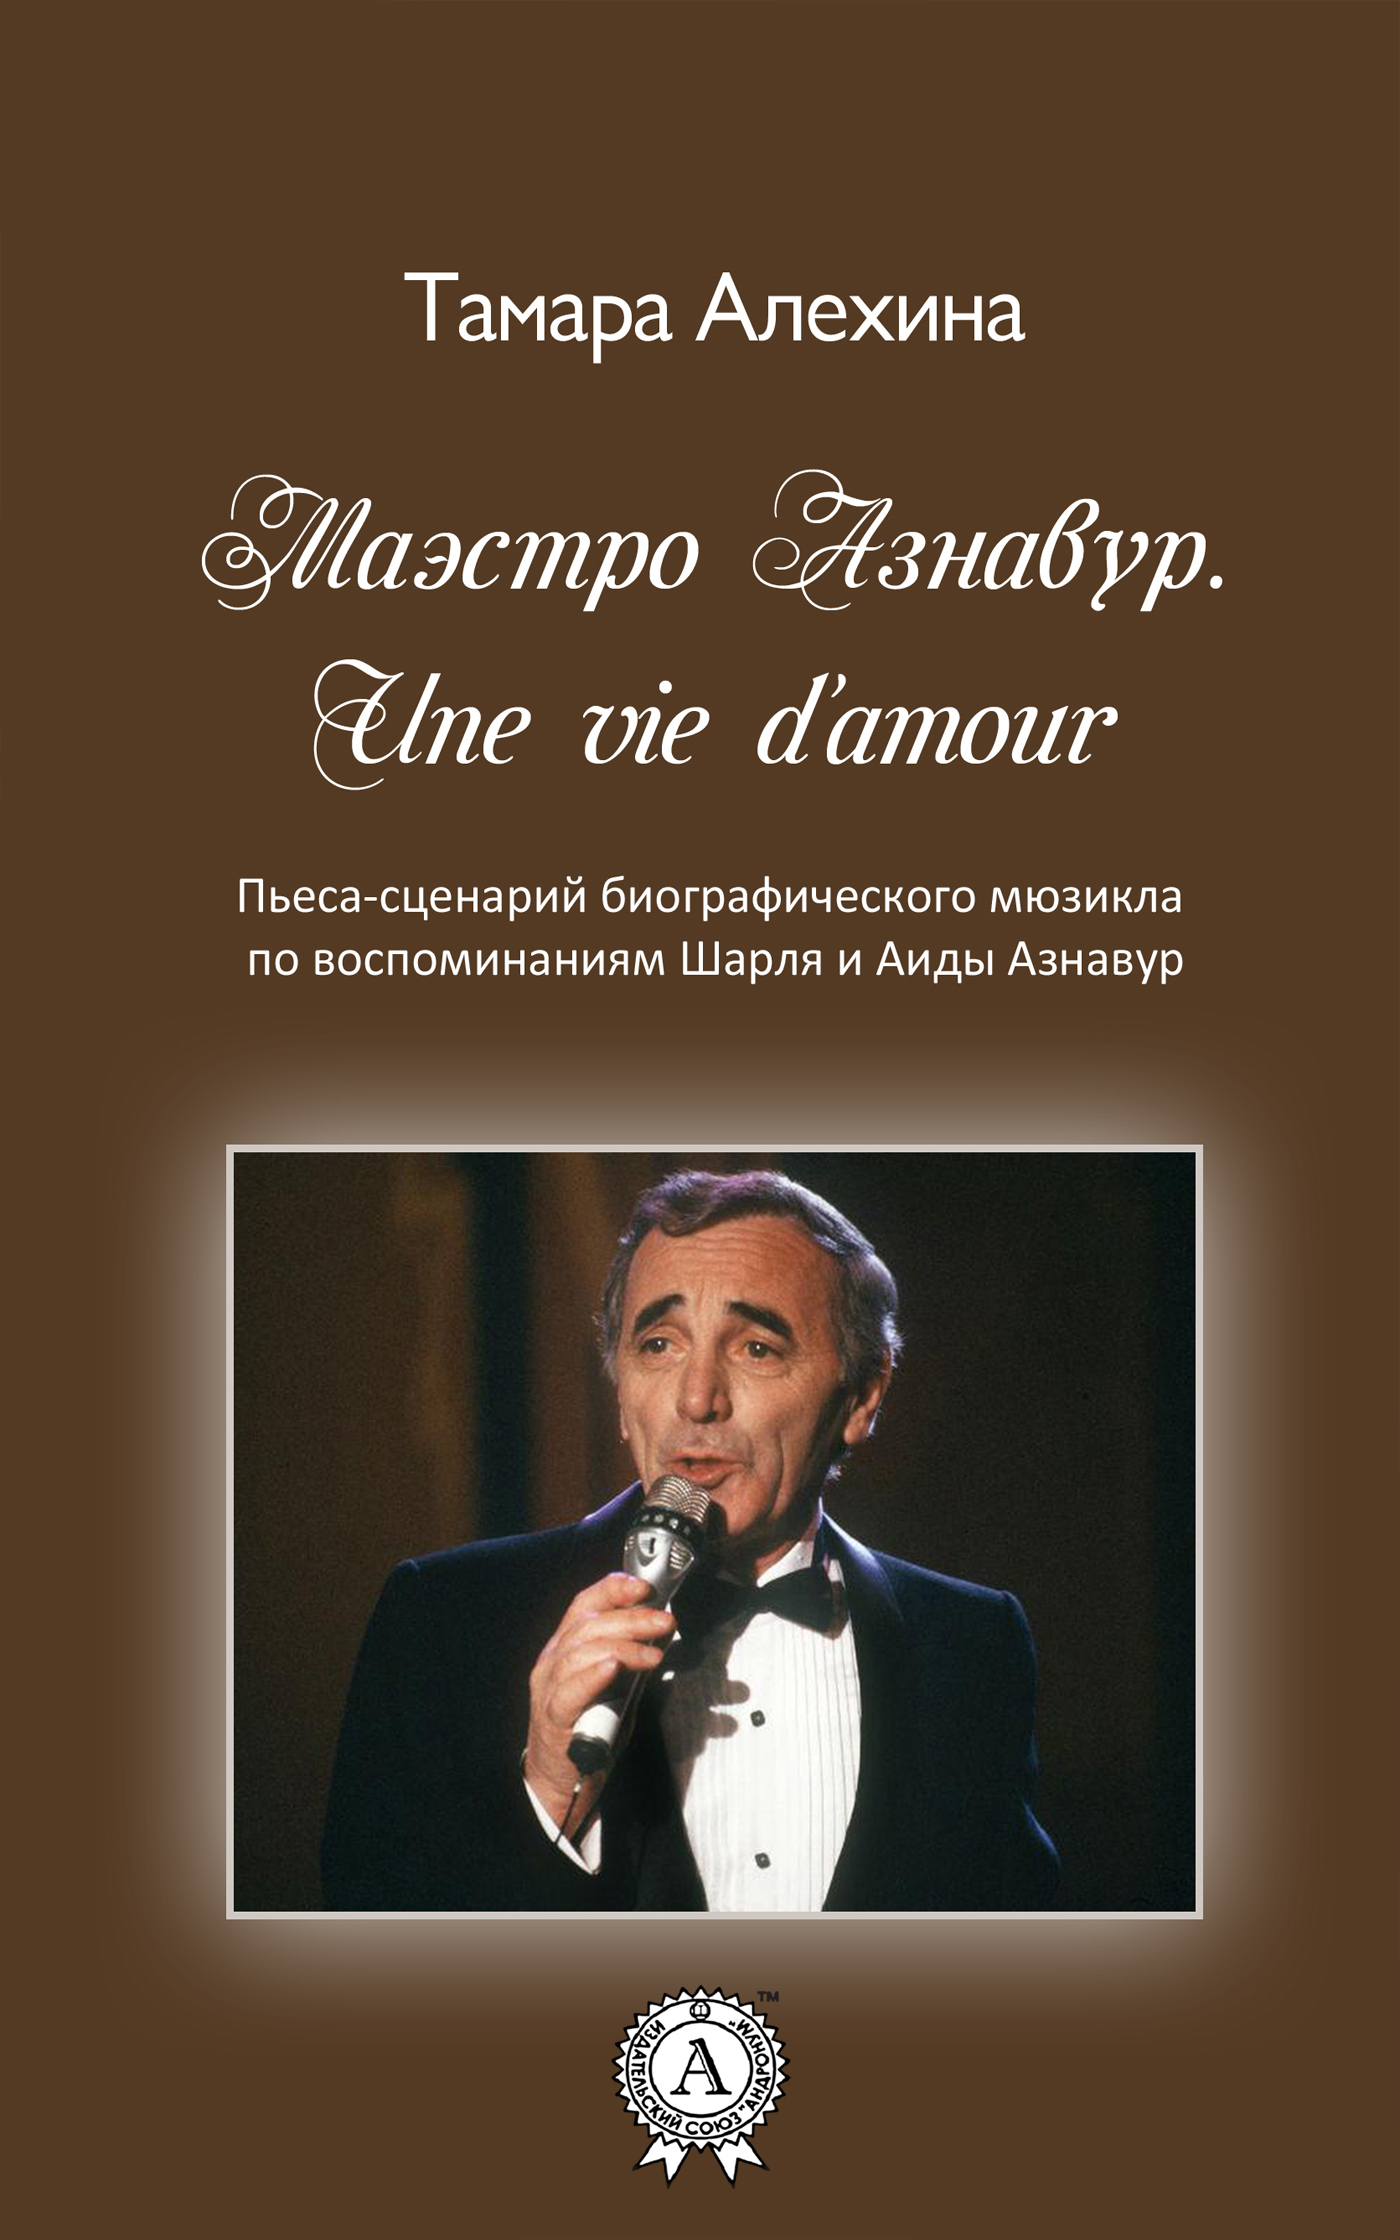 Купить книгу Маэстро Азнавур. Une vie d'amour, автора Тамары Алехиной